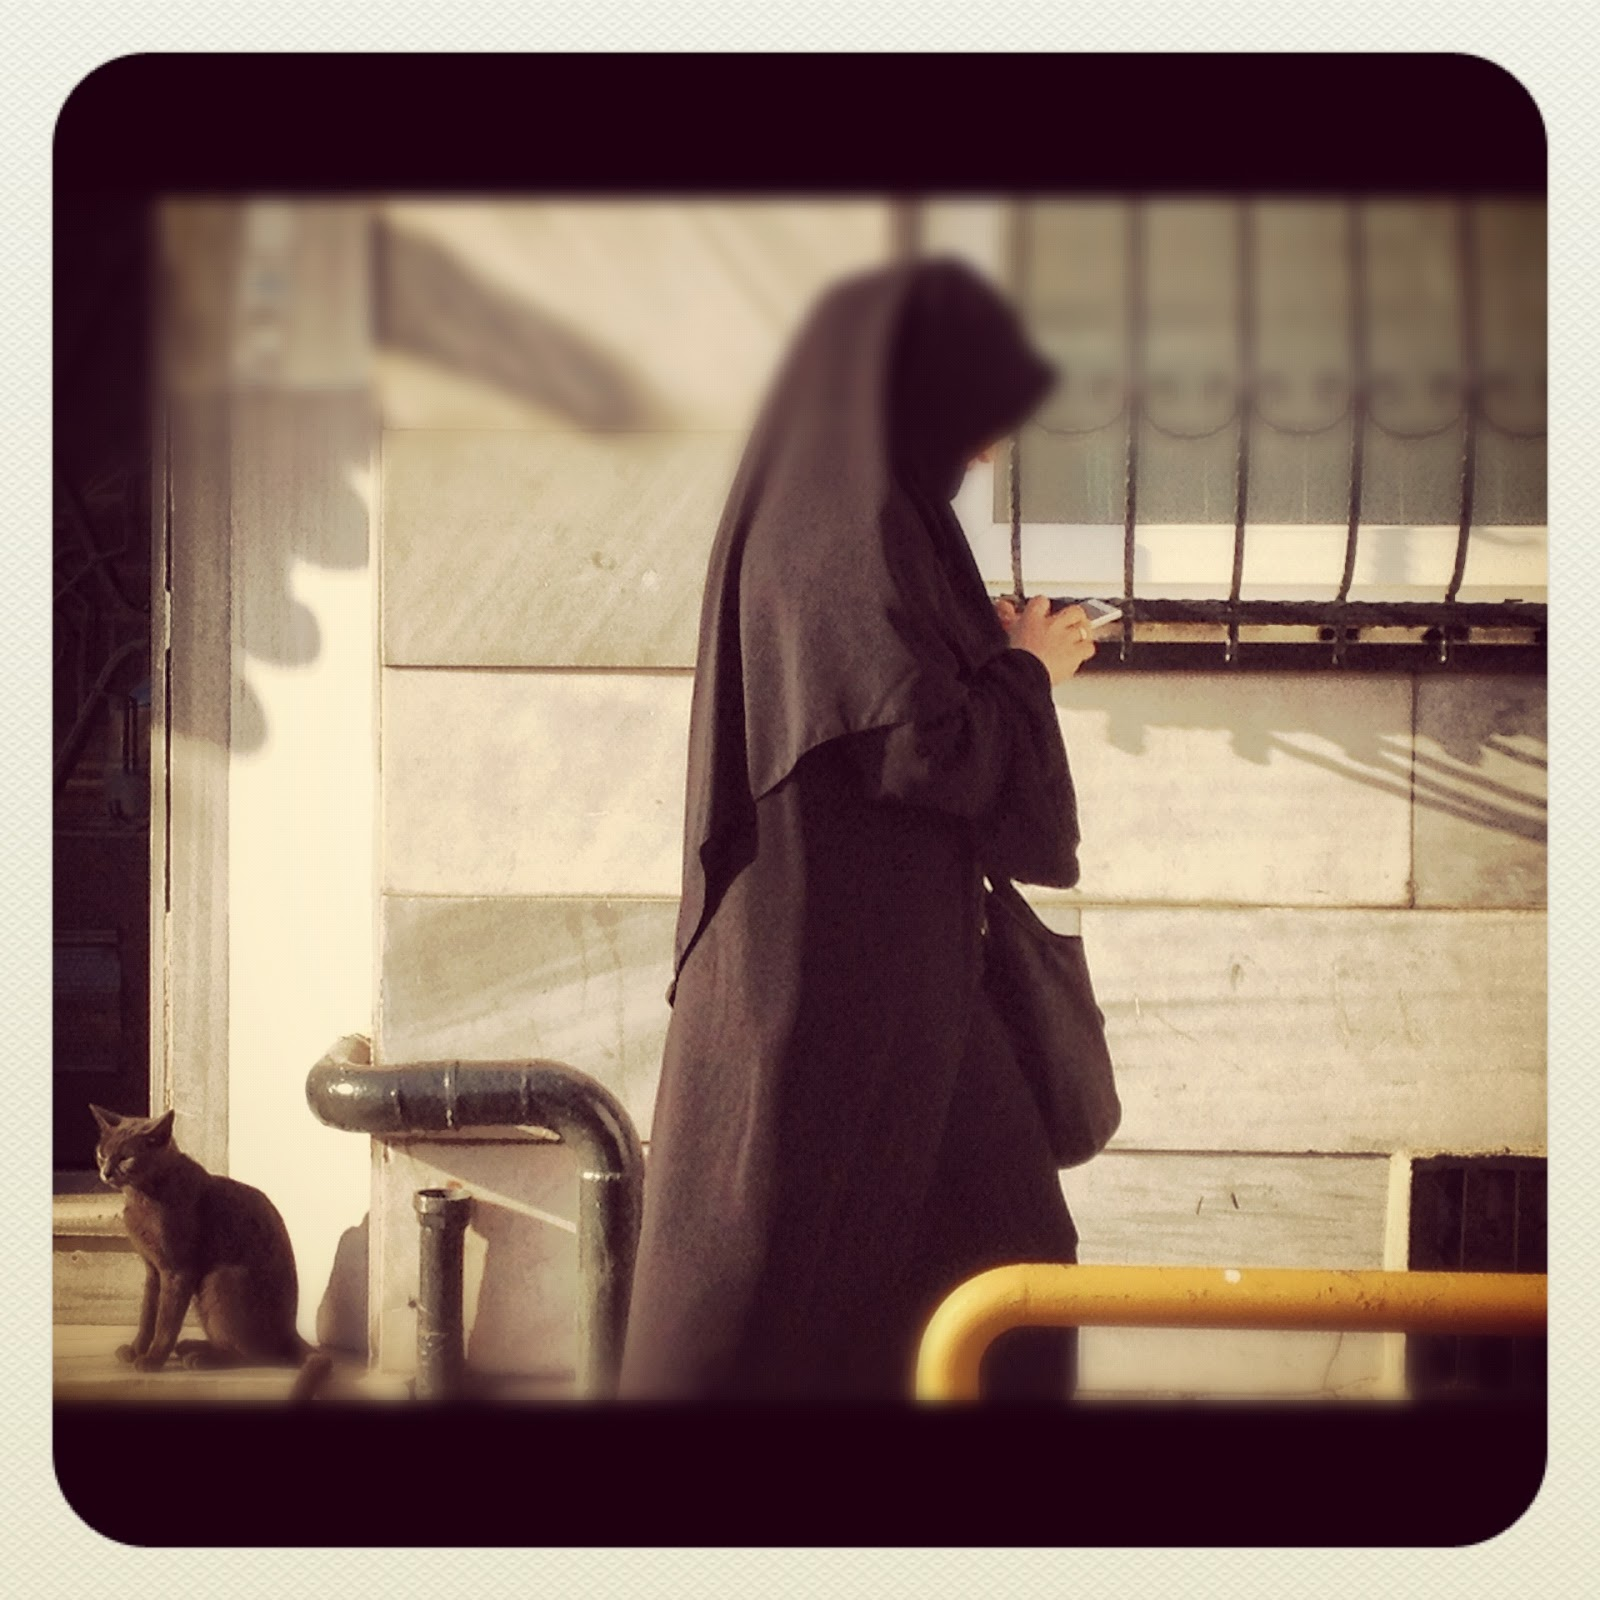 Muslim Woman Texting in Istanbul